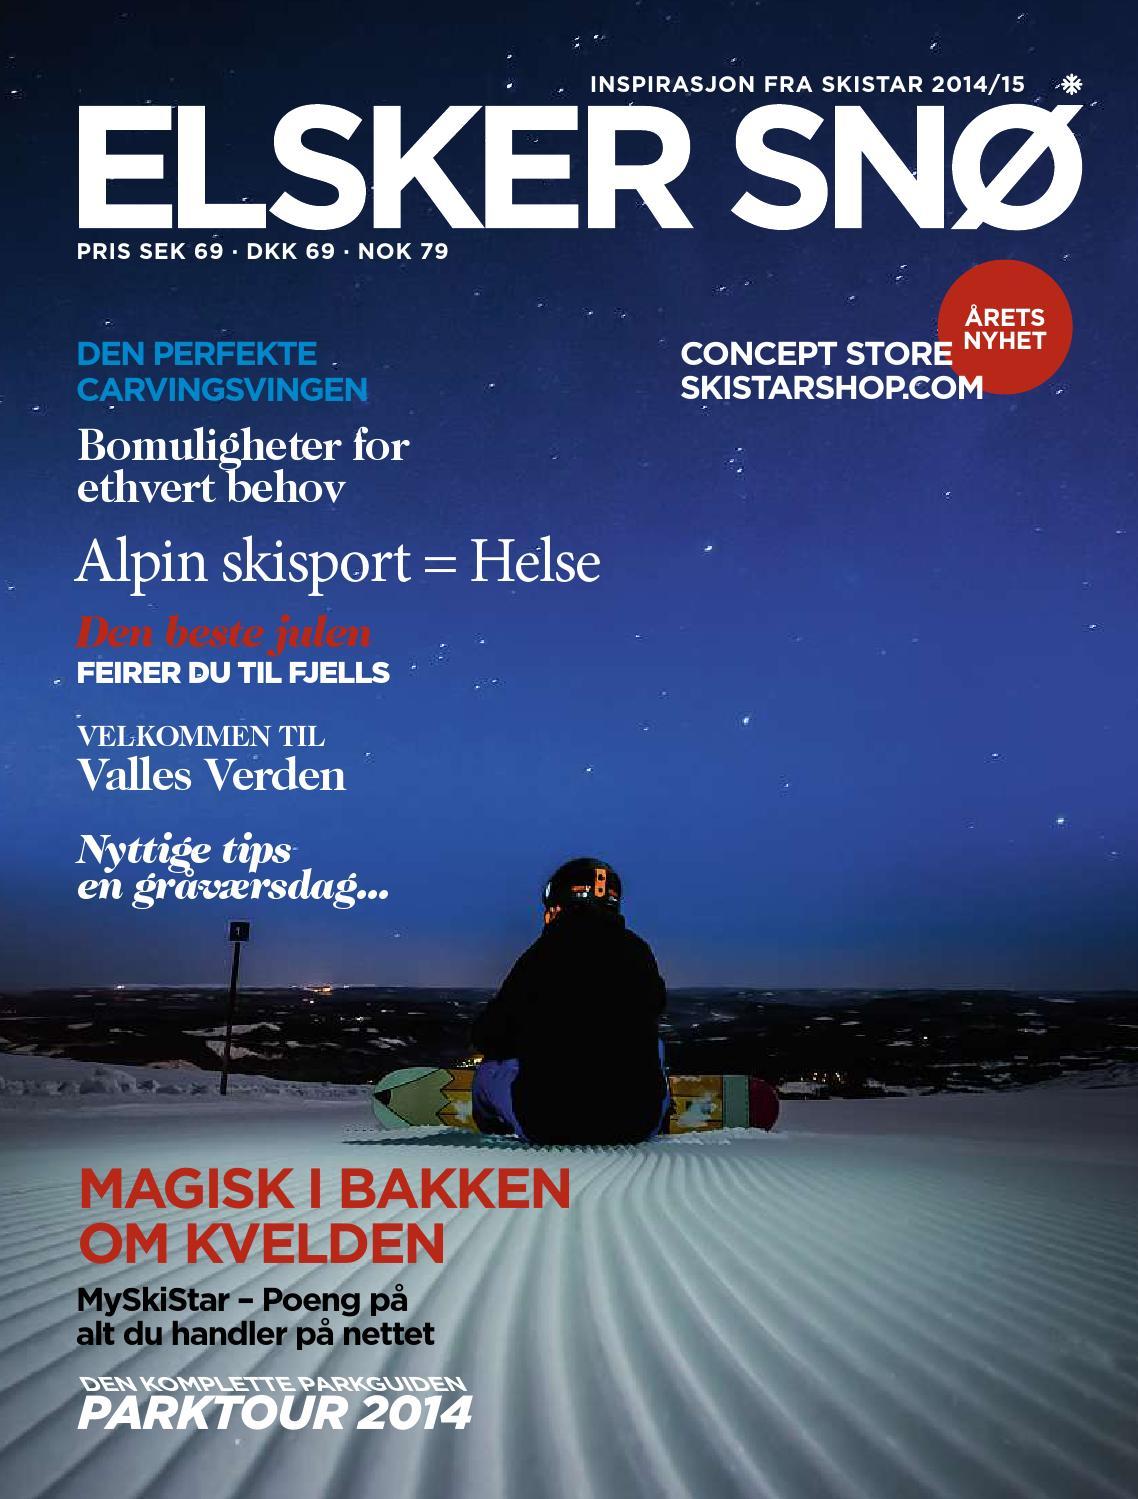 36c52265 Skistar Elsker snø 14/15 by SkiStar - issuu